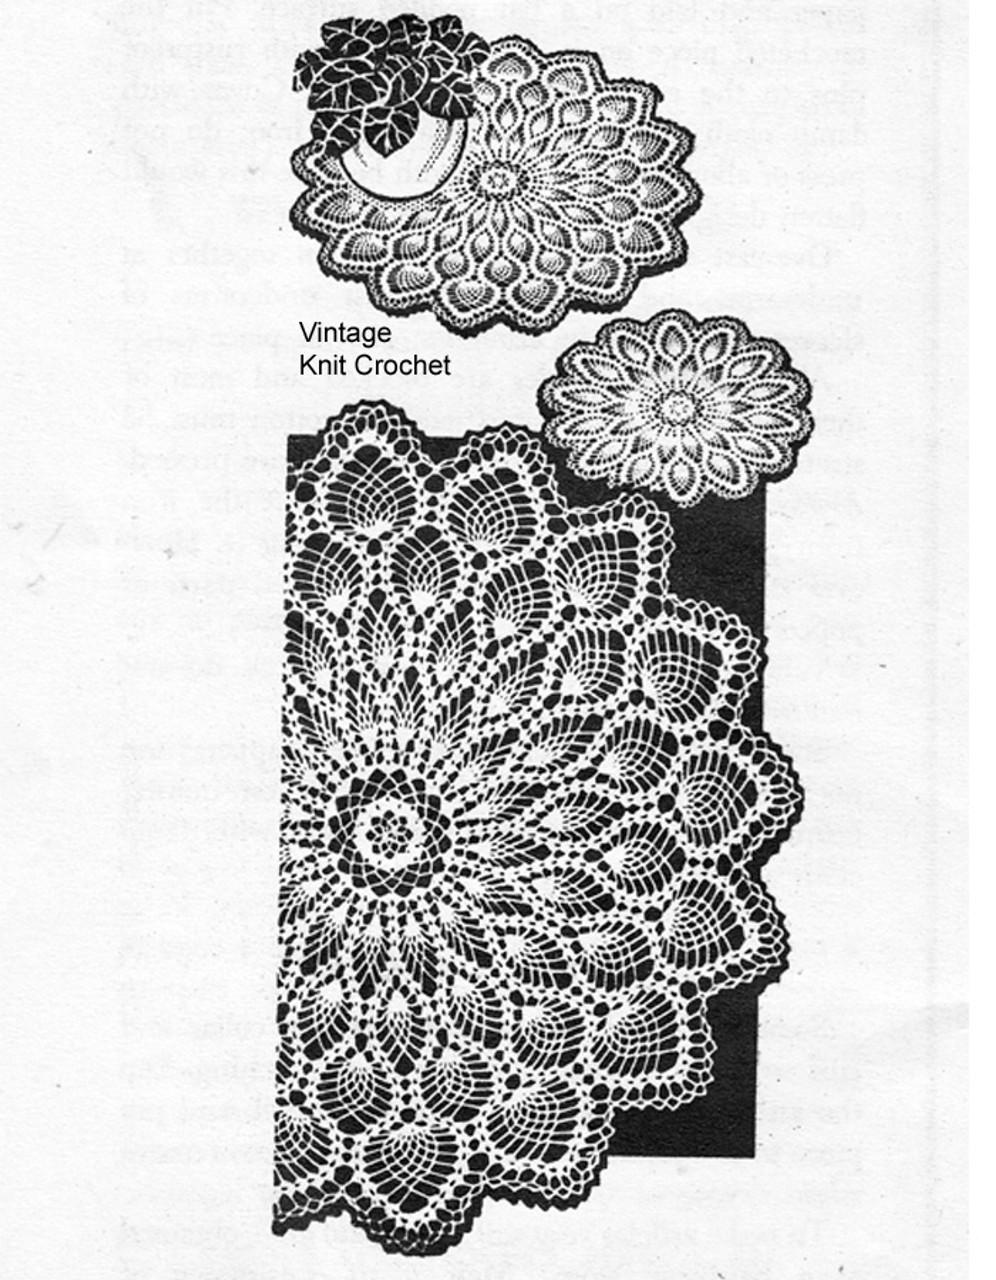 Mail Order Crochet Pineapple Doilies Pattern, Design 3101